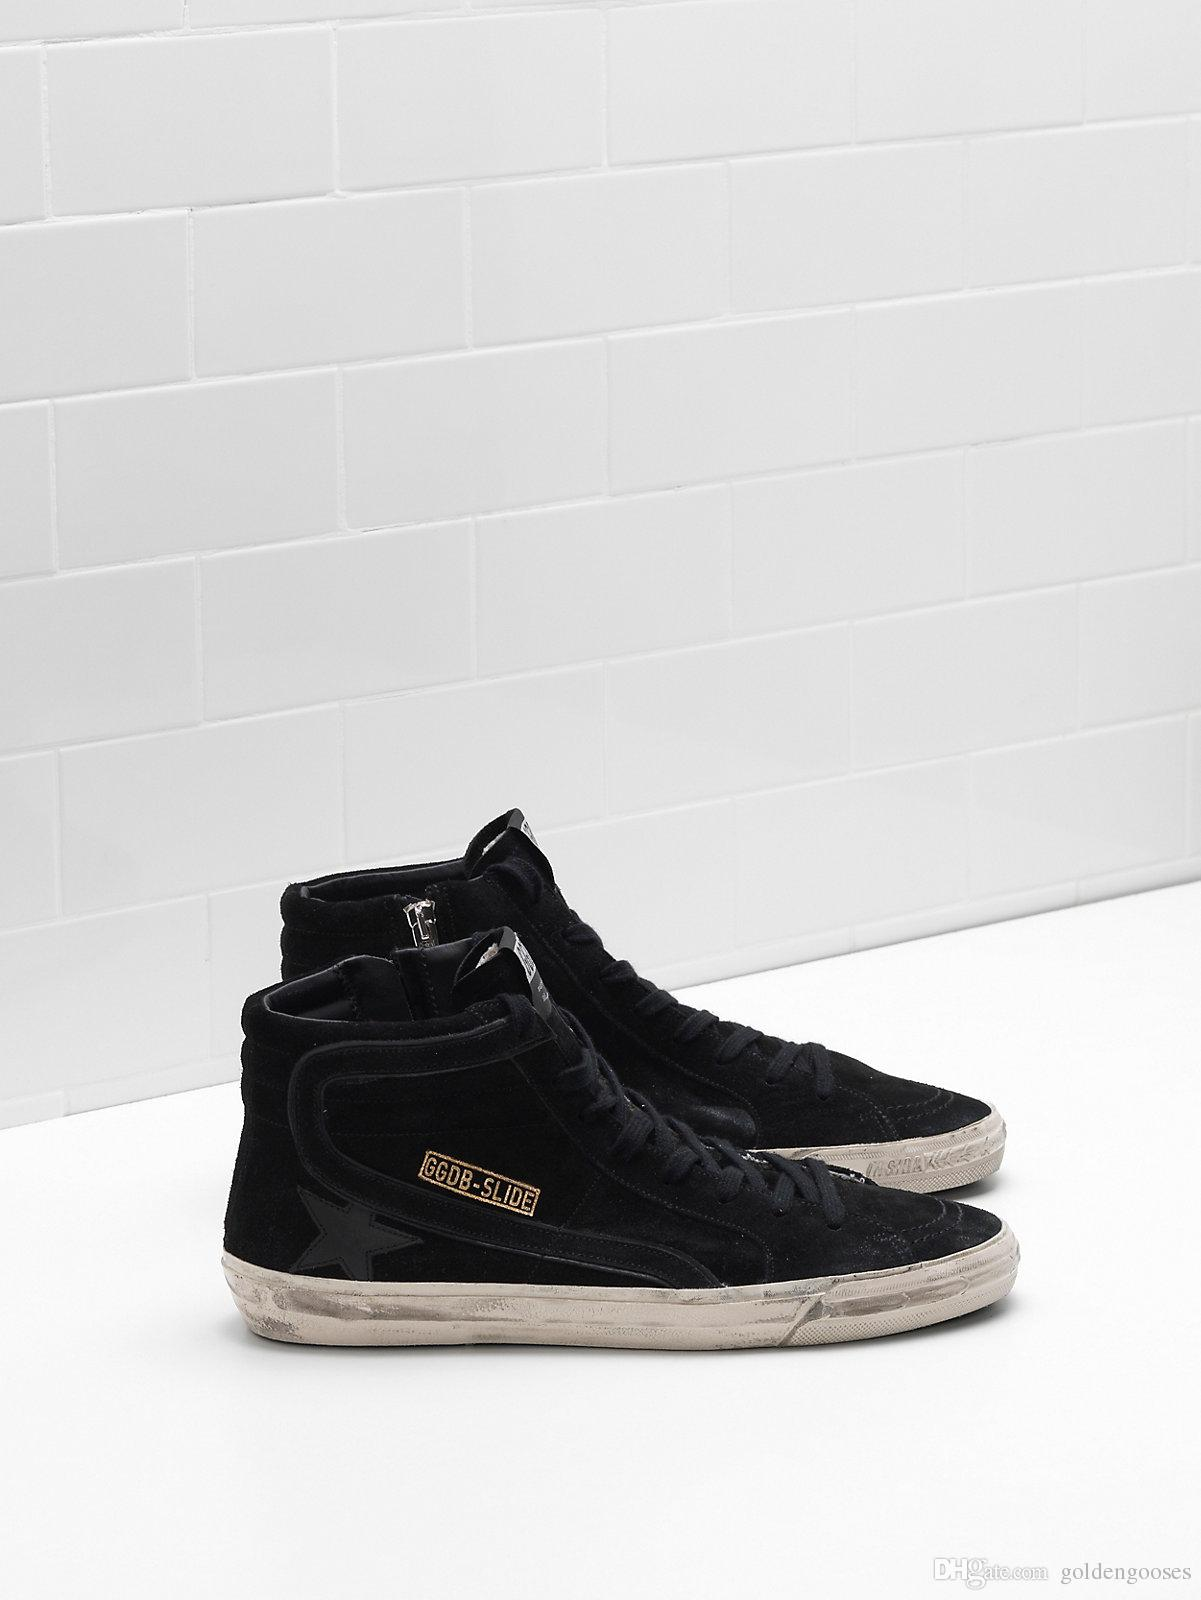 3adfa786d86a4 Italy Men Women Style Femme Homme Slide Sneakers Calf Suede Upper ...